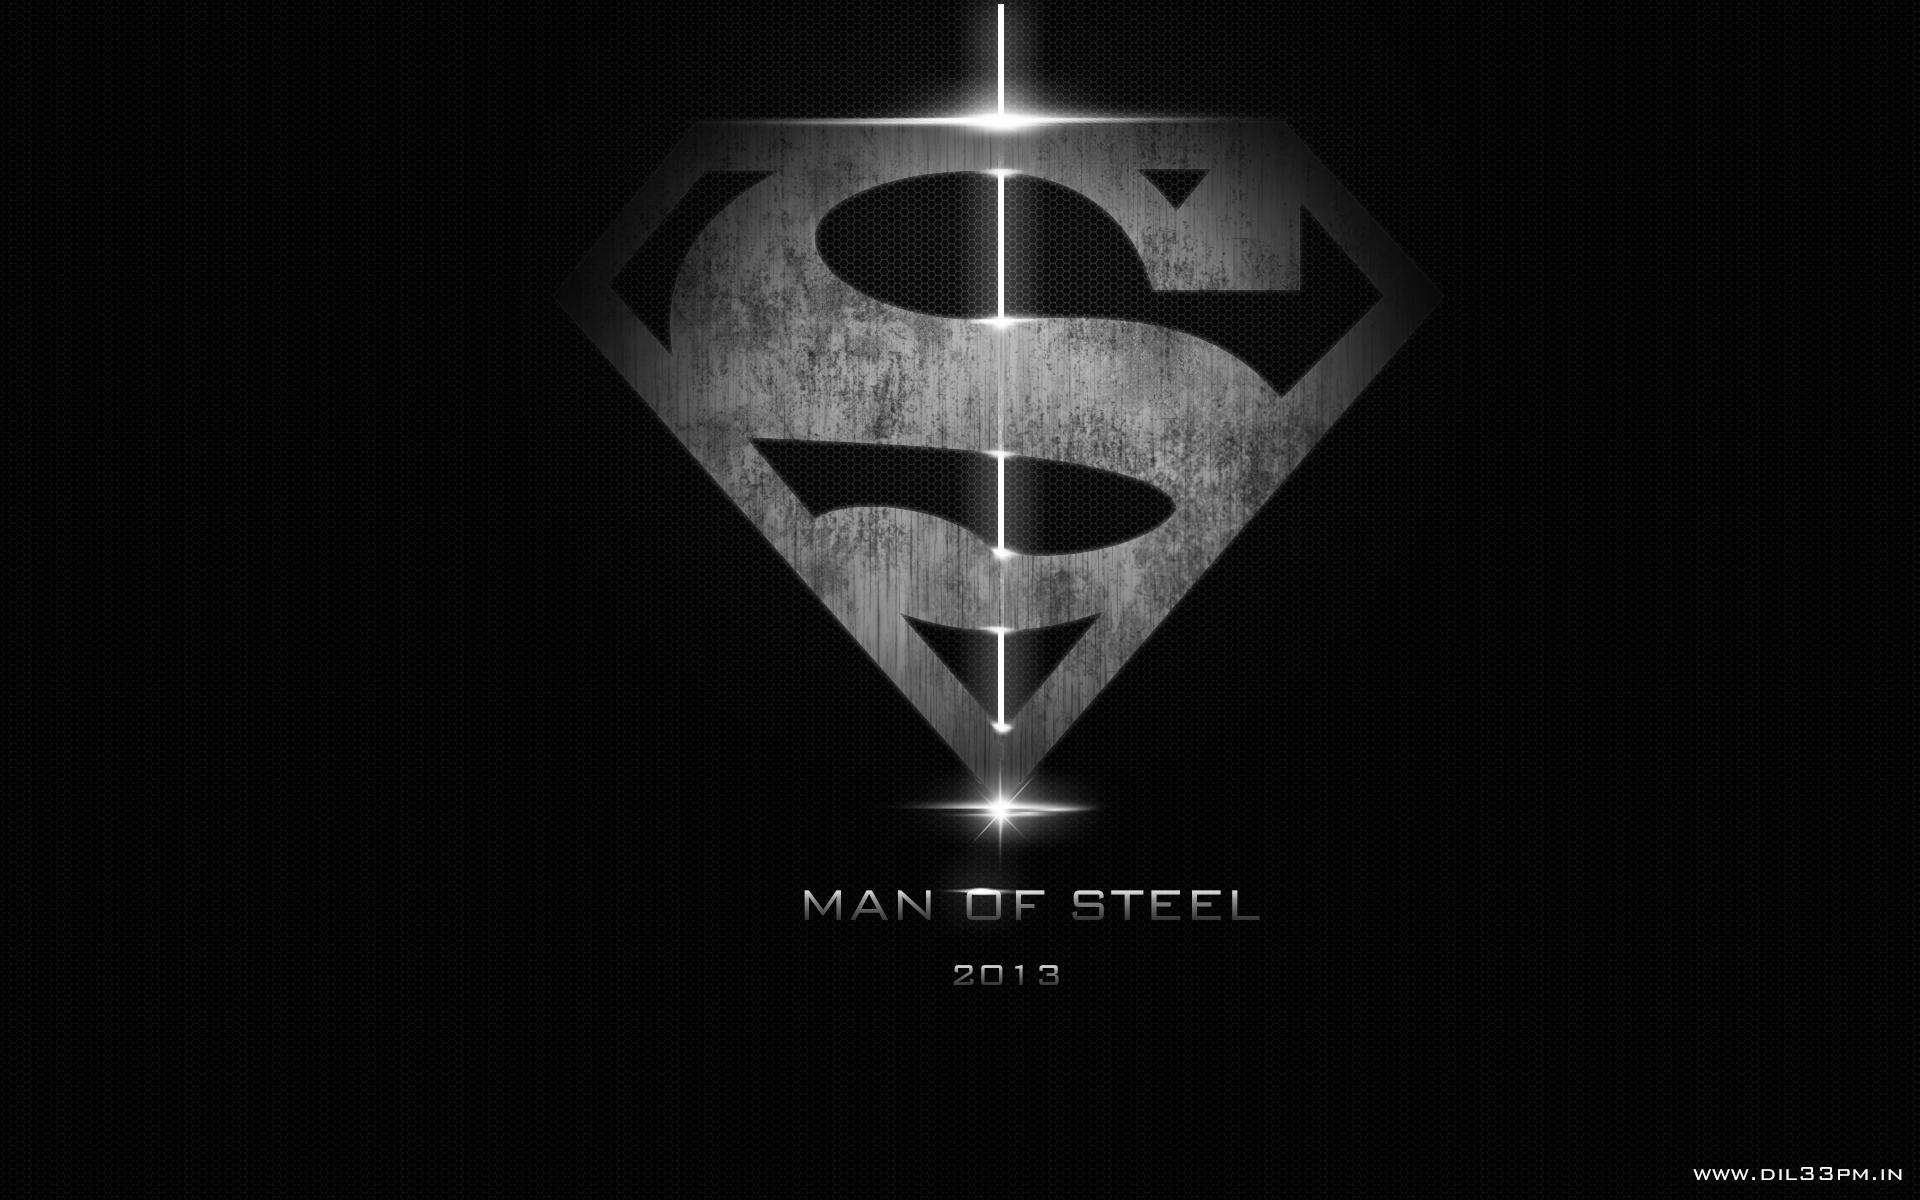 Superman Man of Steel Dark Logo Exclusive HD Wallpapers 1904 1920x1200